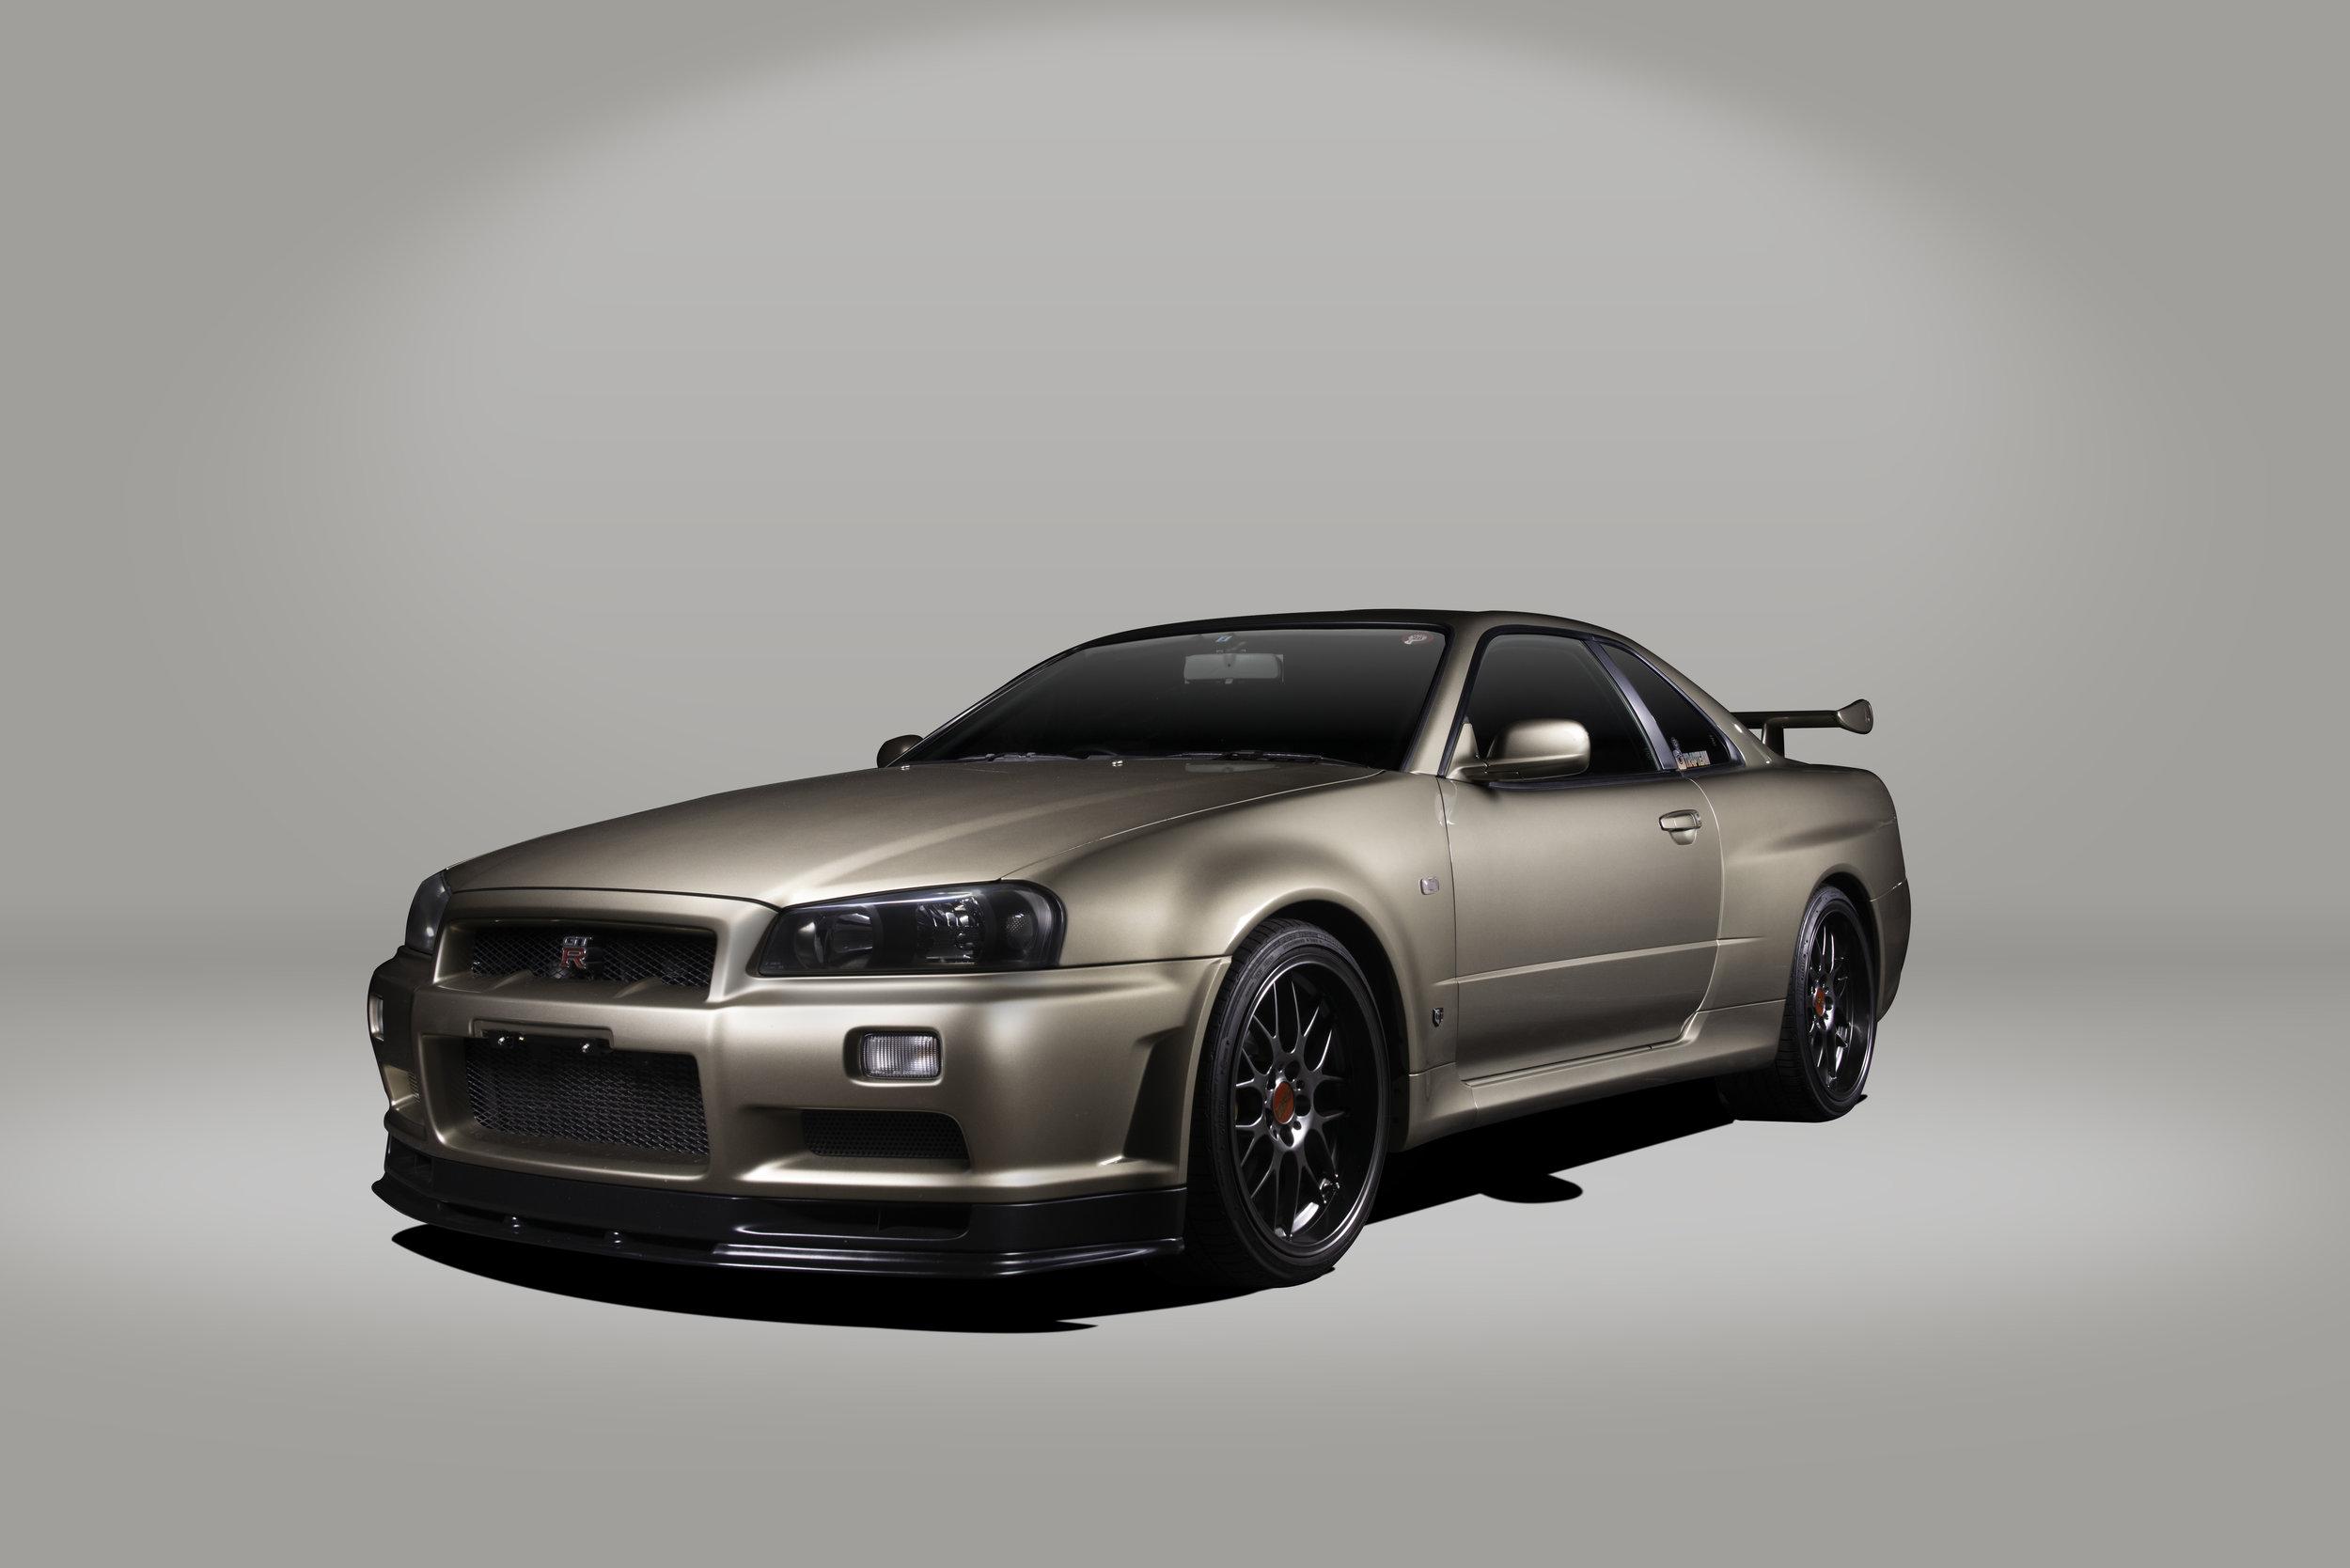 2001 R34 GTR M-Spec